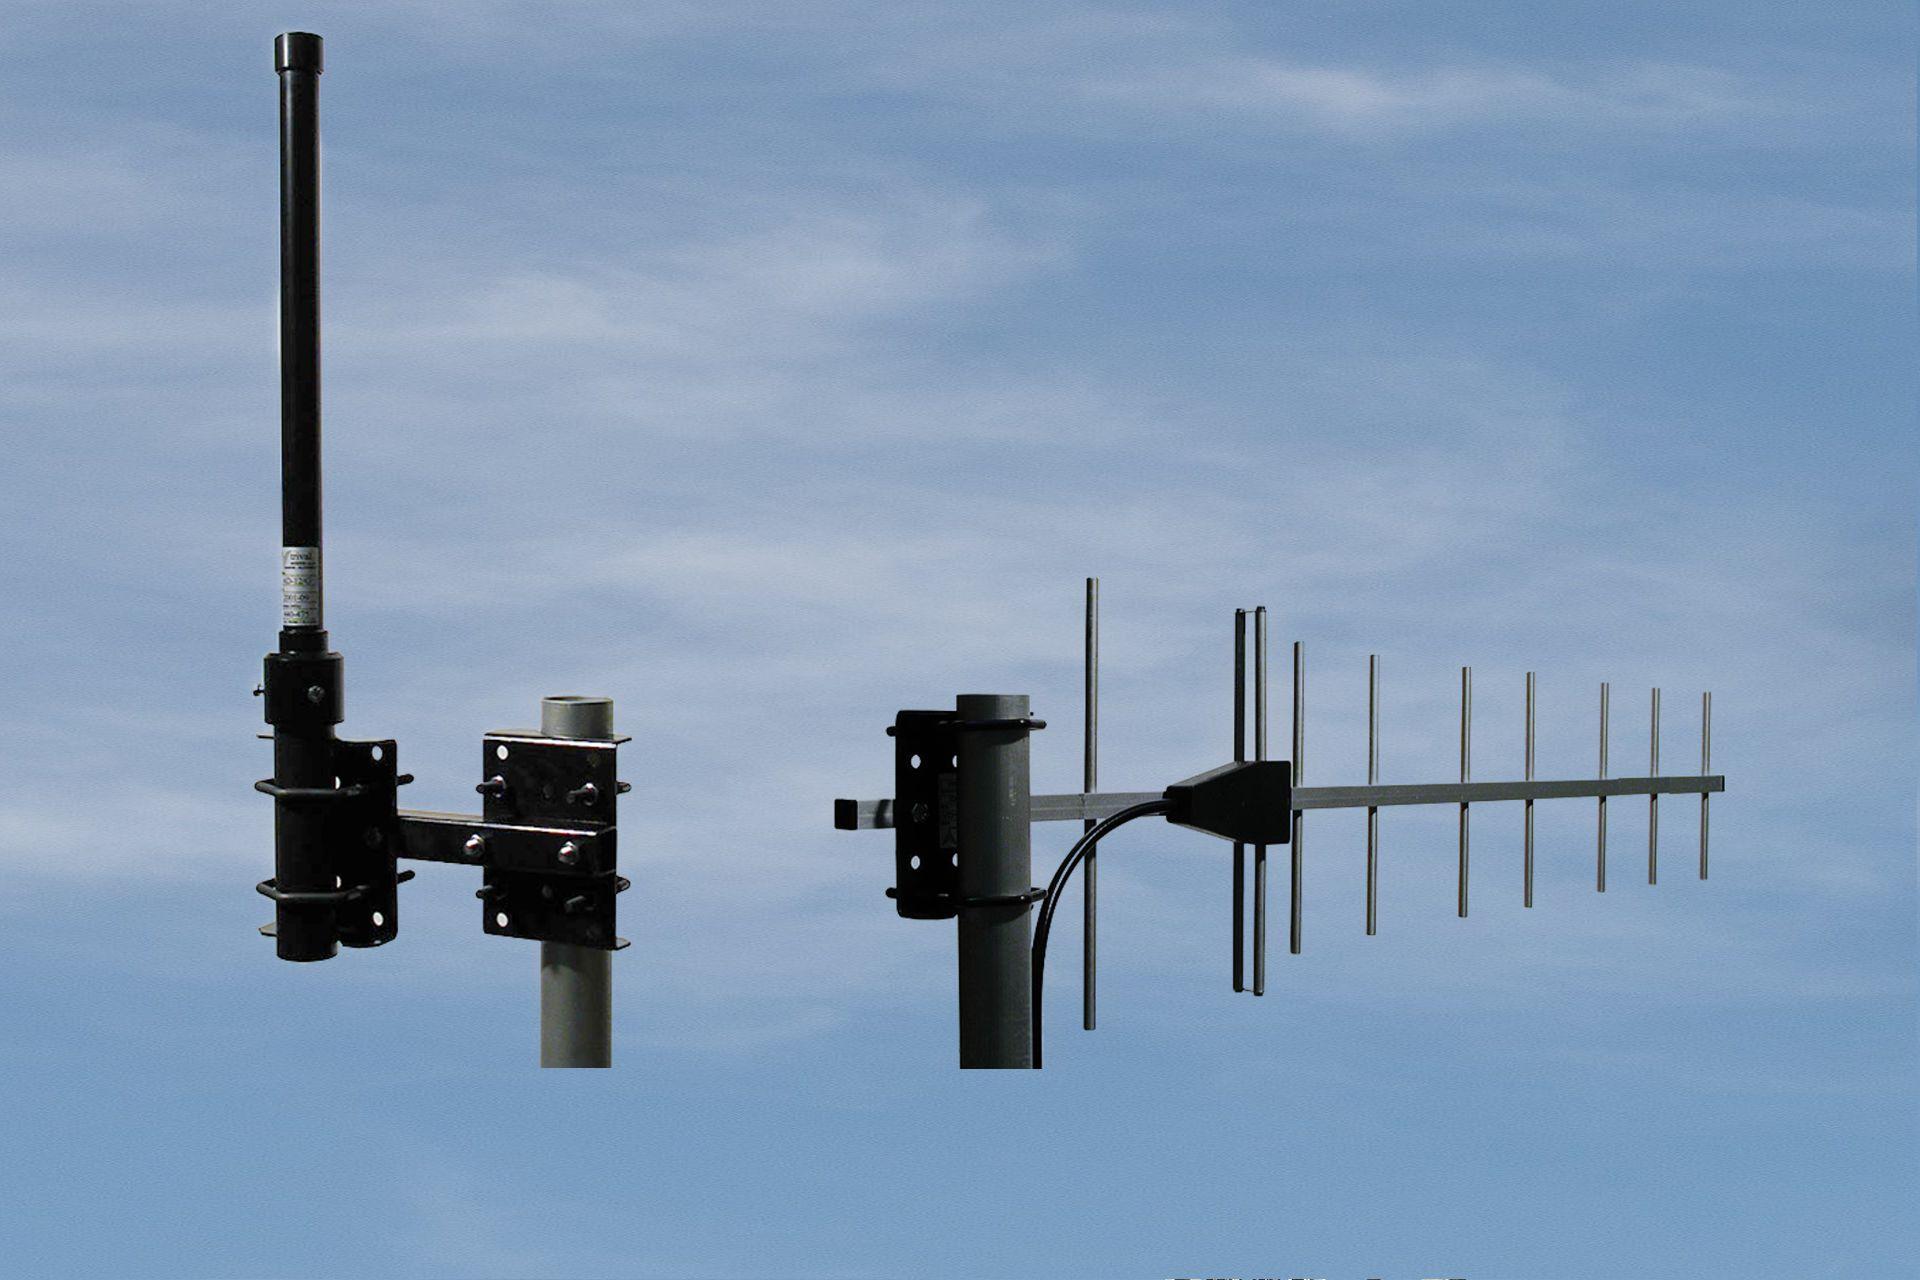 UHF ANTENNAS 380 - 1000 MHz